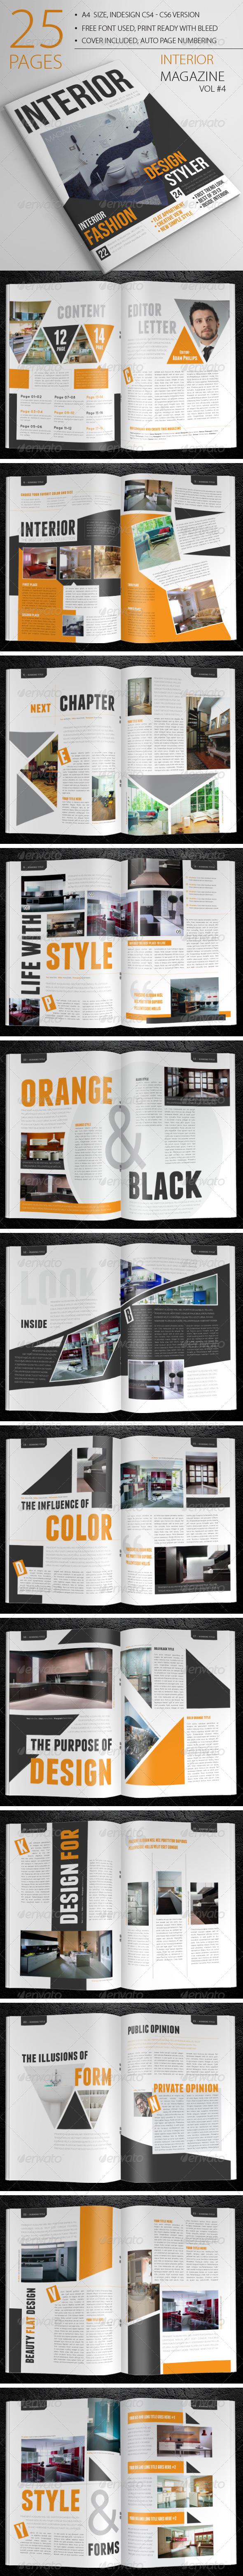 GraphicRiver 25 Pages Interior Magazine Vol4 6824902